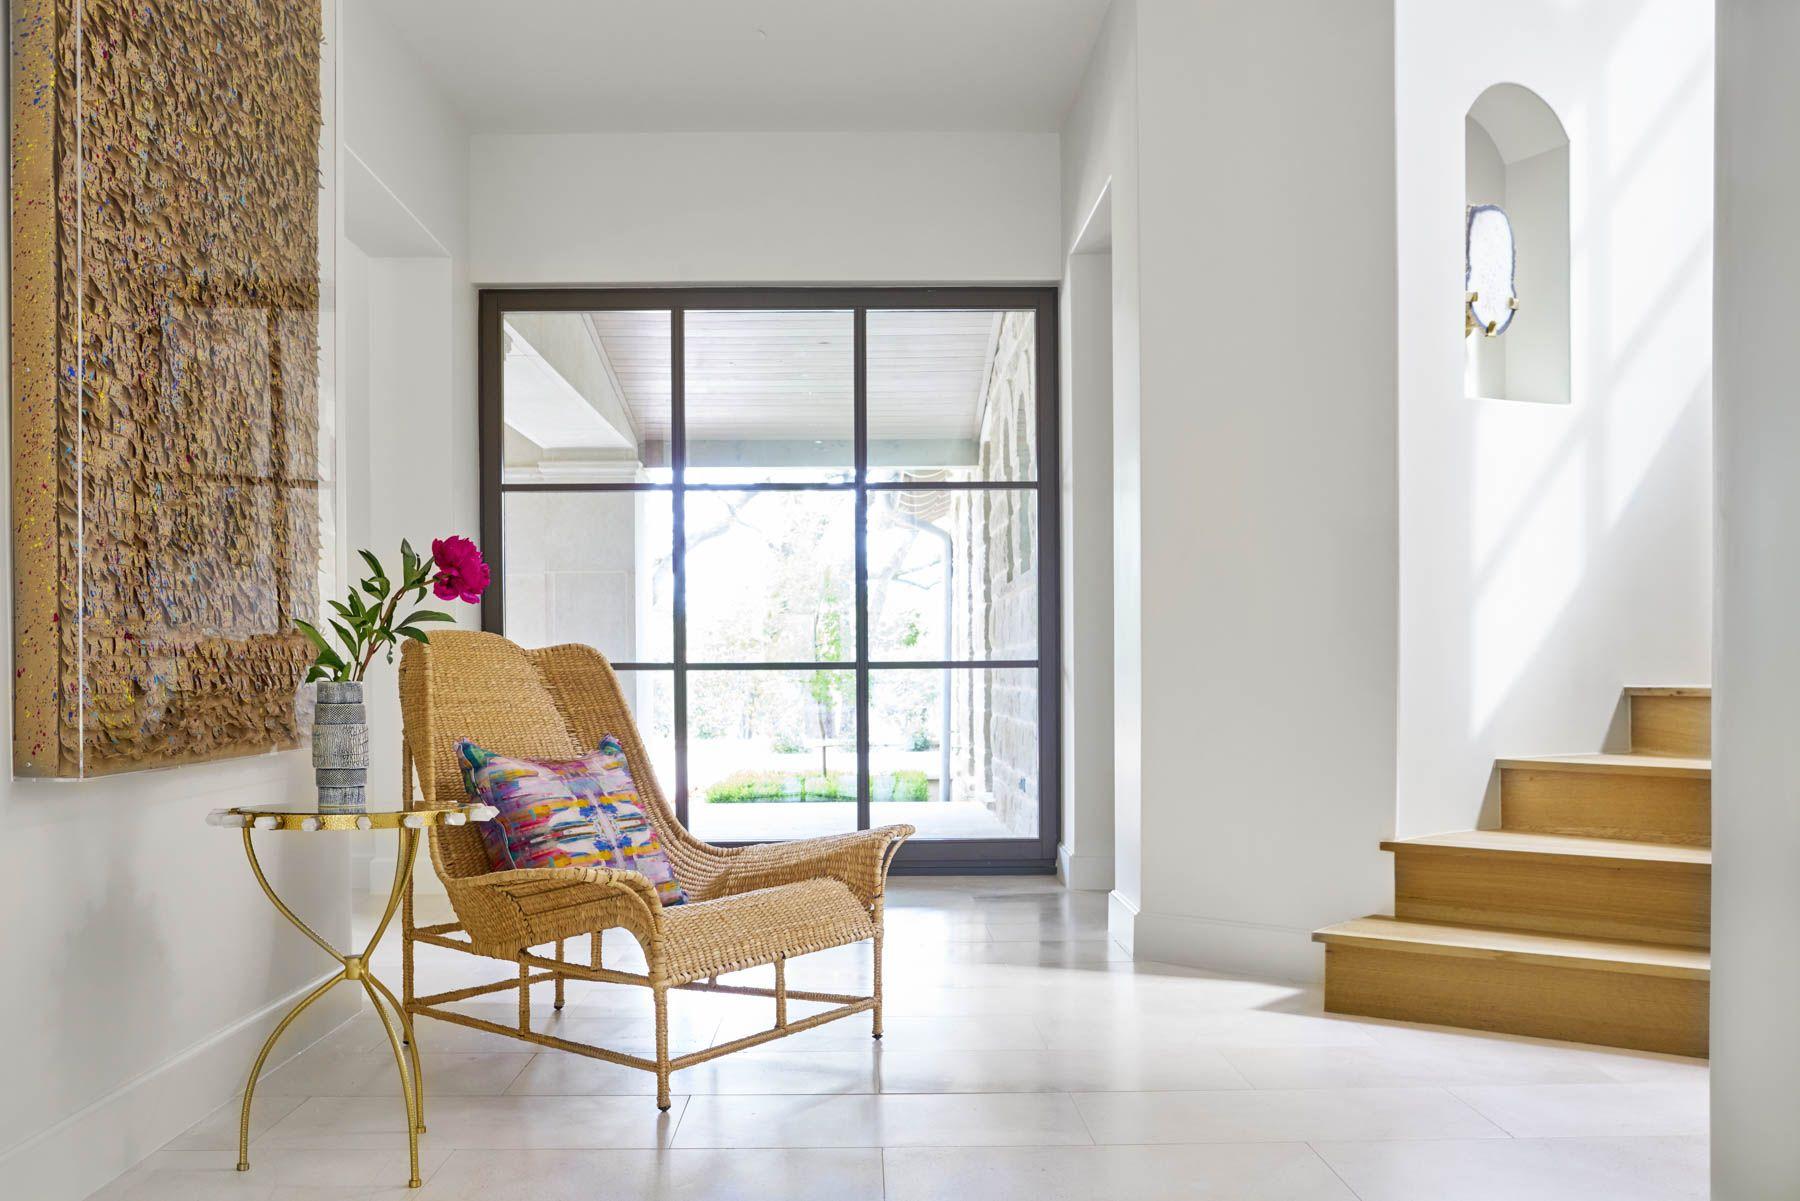 Seneca Dr Residence | Living Space | Entry Way